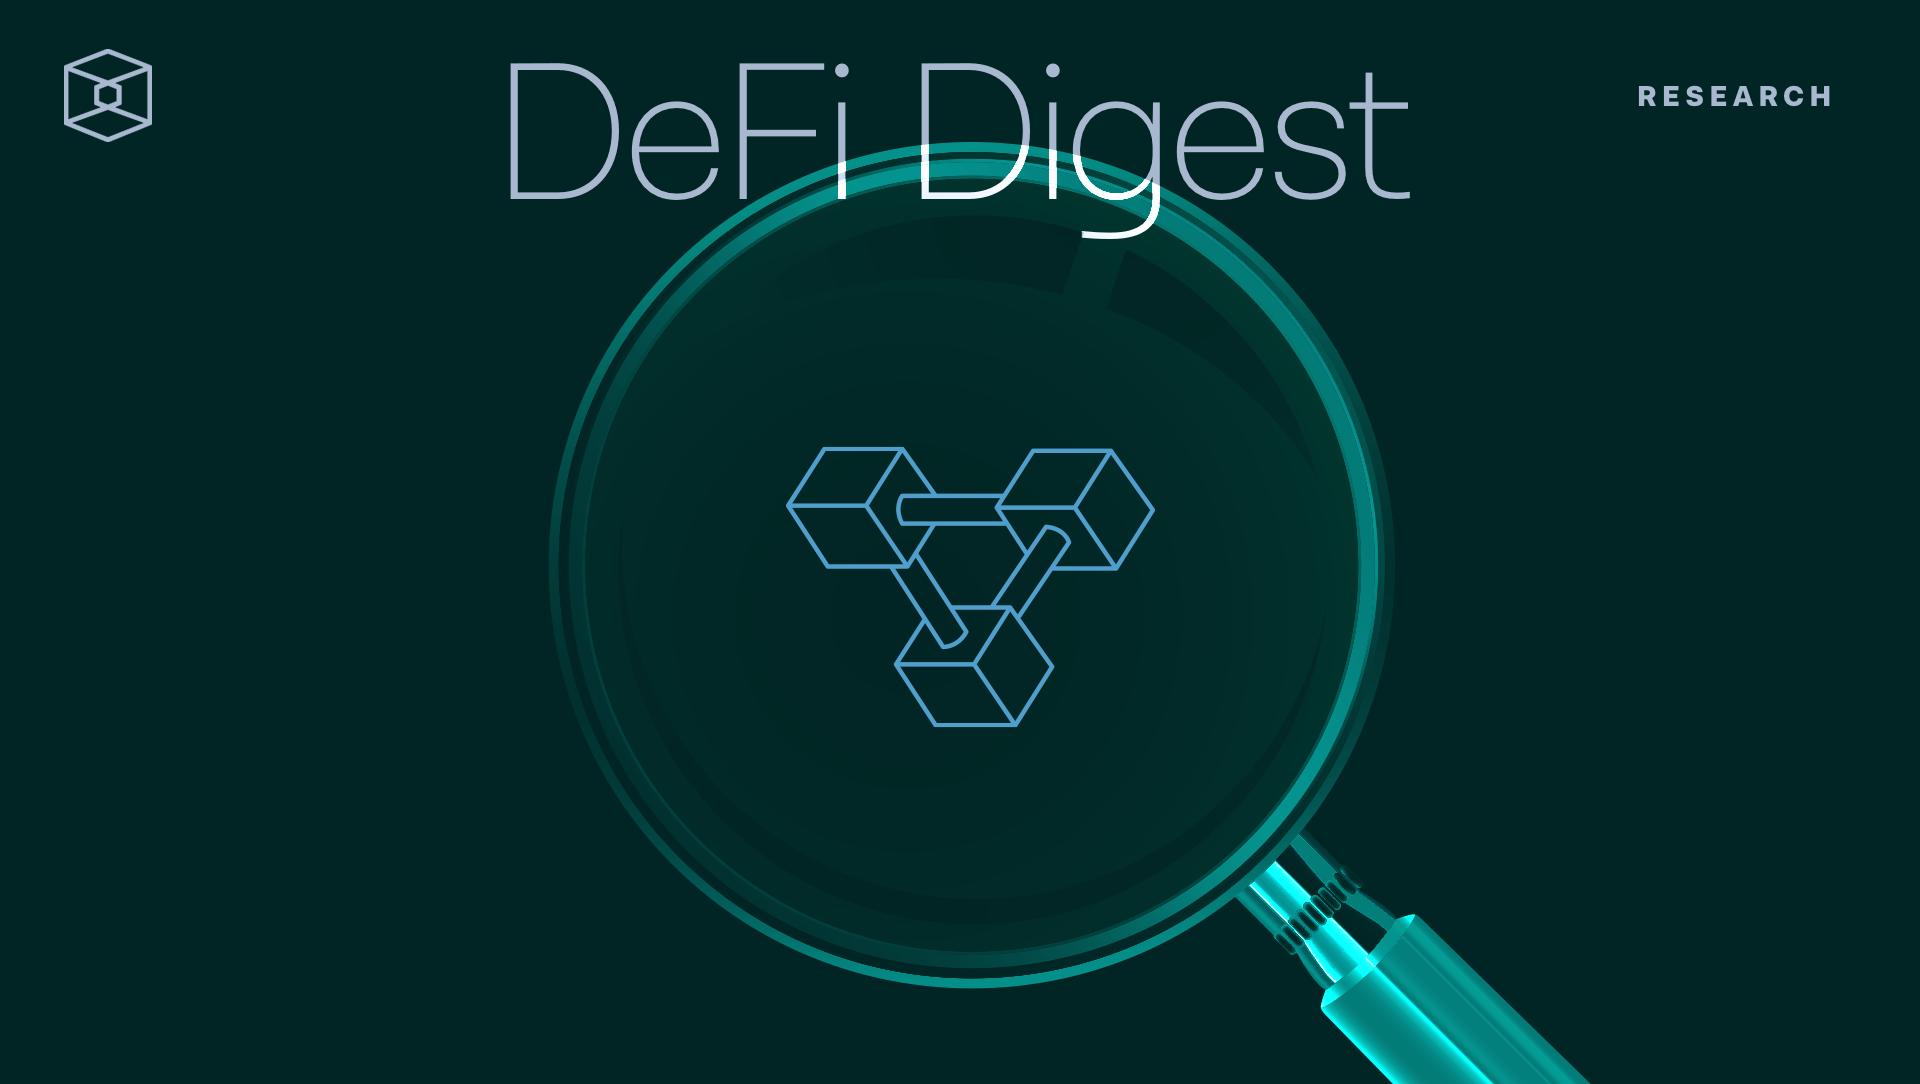 DeFi Digest: WRAP LP androllups